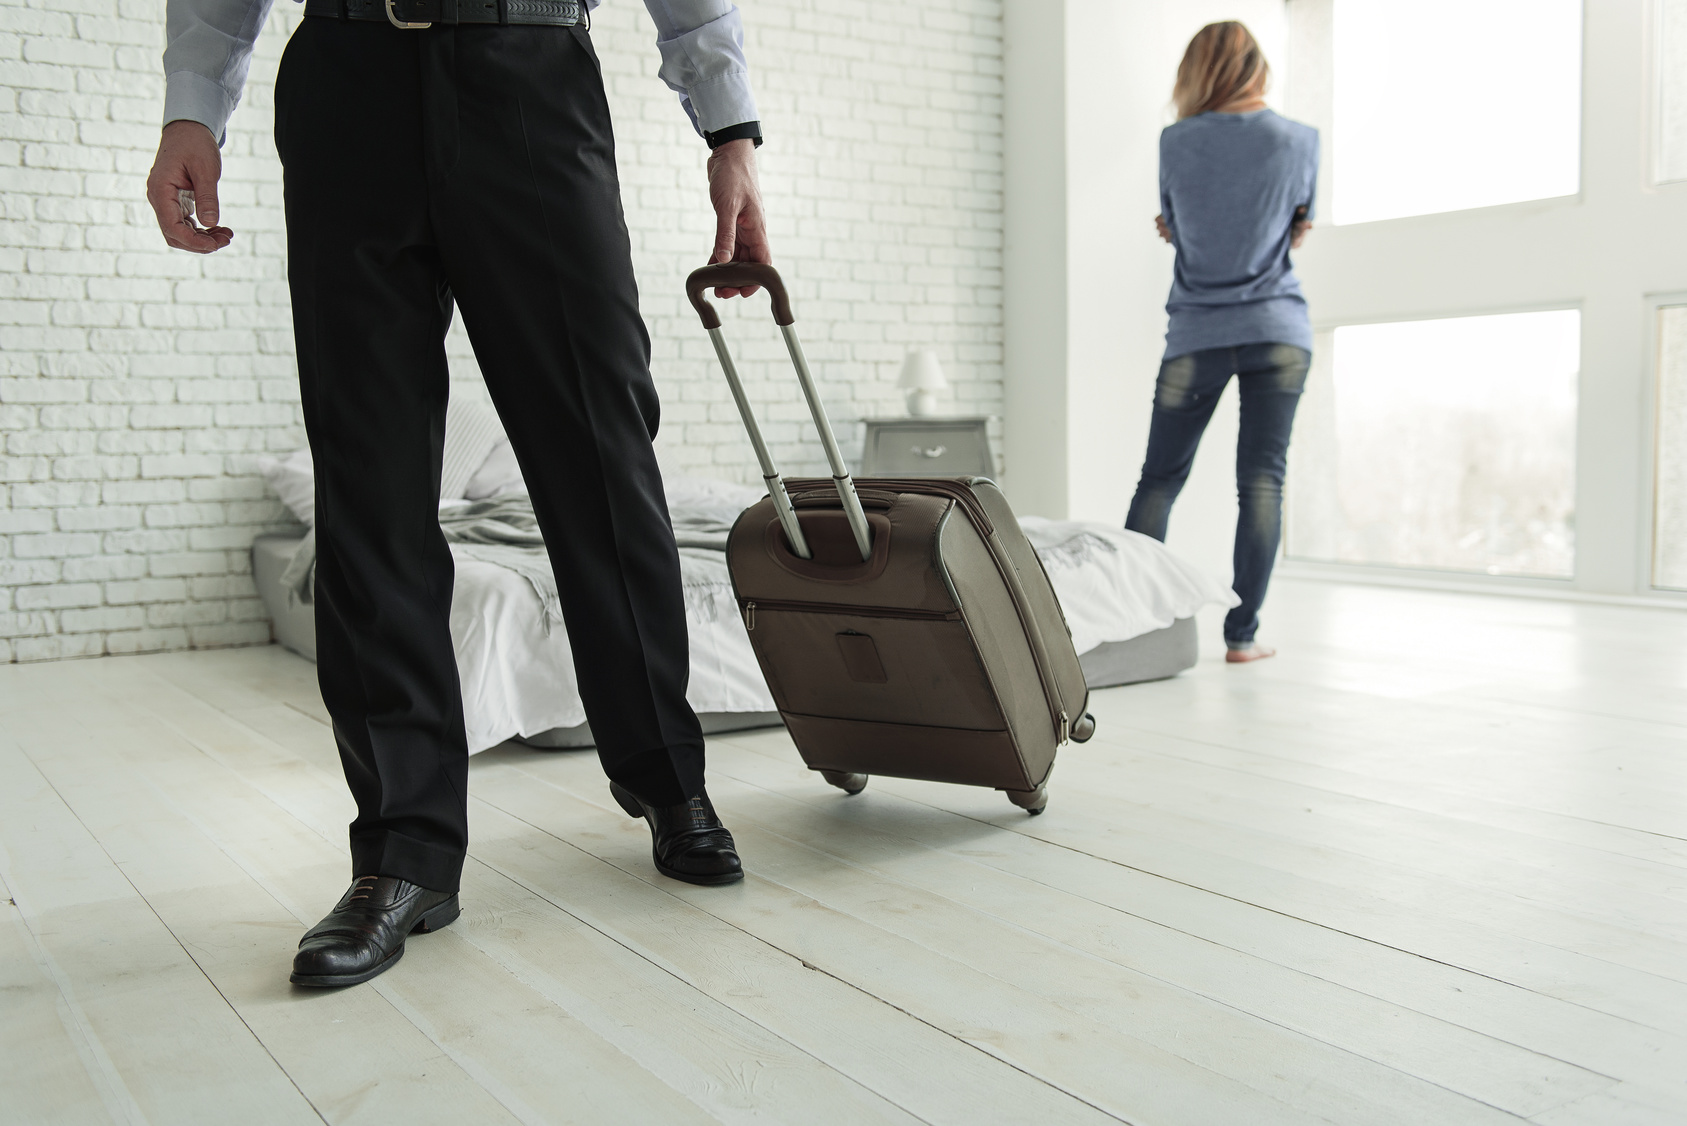 муж ушел на работу а жена онлайн - 7